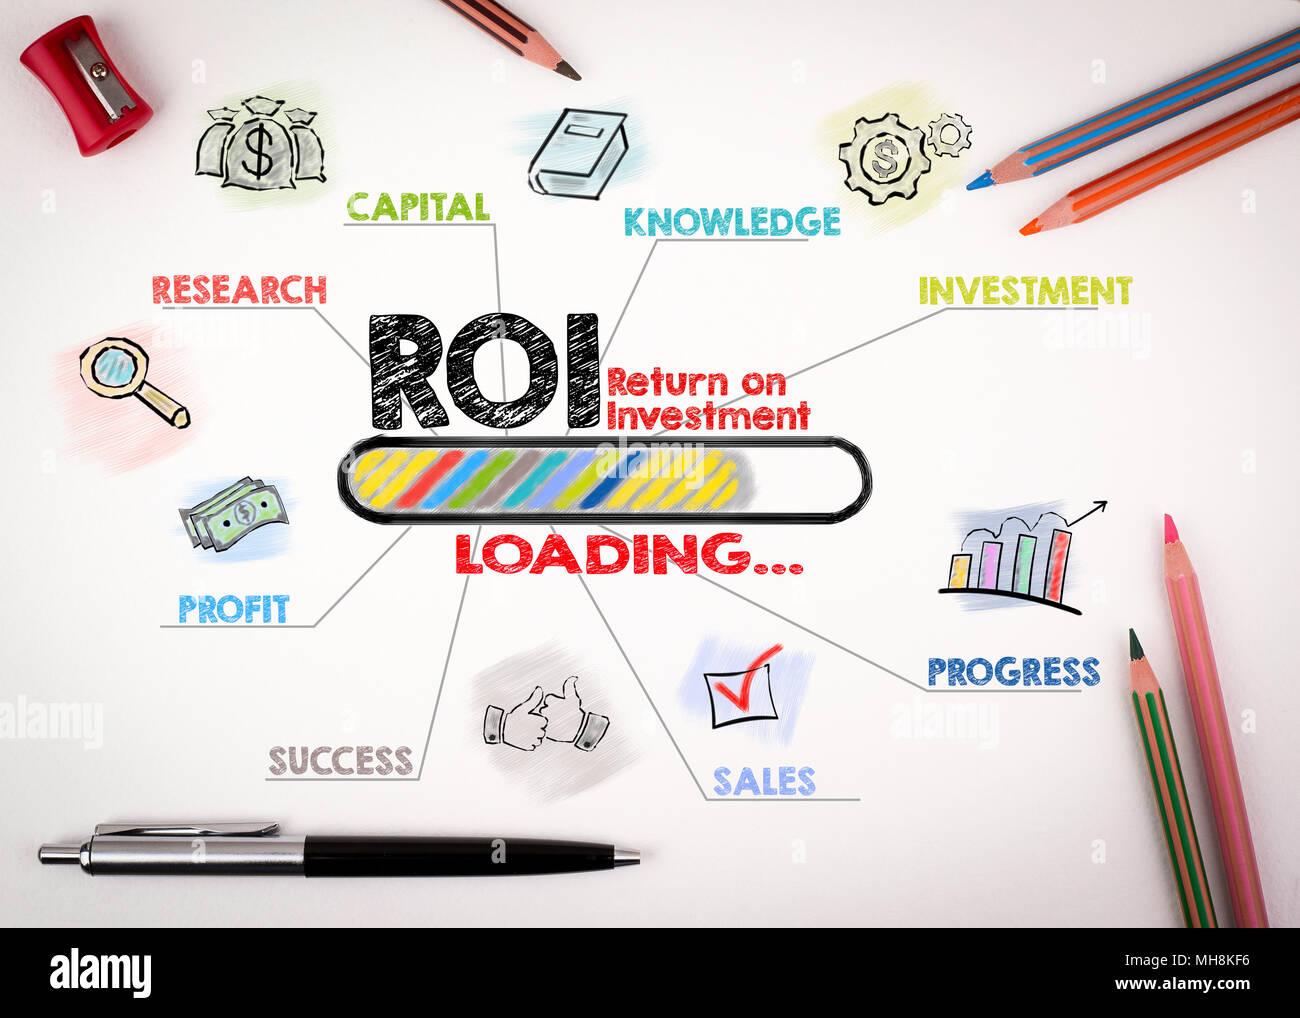 ROI Return on Investment Concept - Stock Image